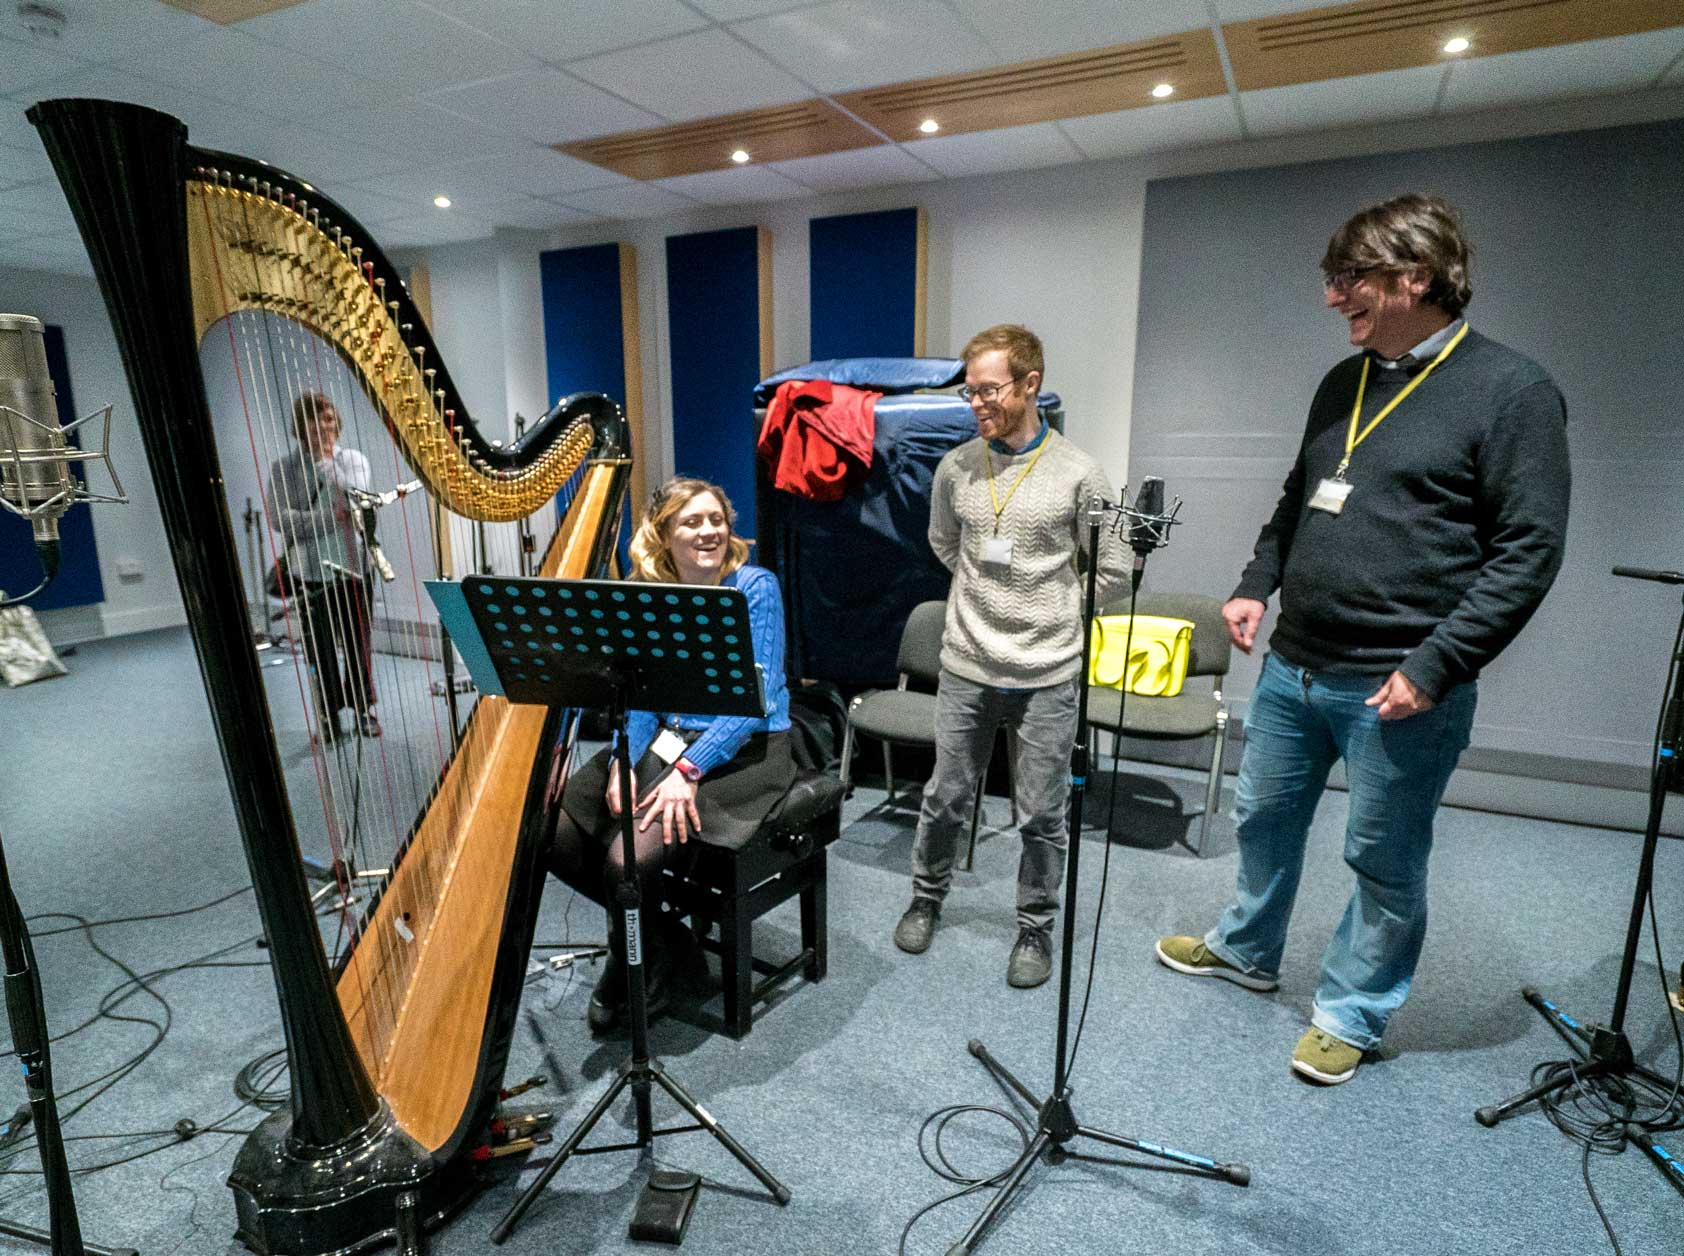 Recording the original soundtrack, from left to right: Cerian Holland (Harpist), Aaron Buckley (Soundtrack Composer), Jools Scott (Pianist)